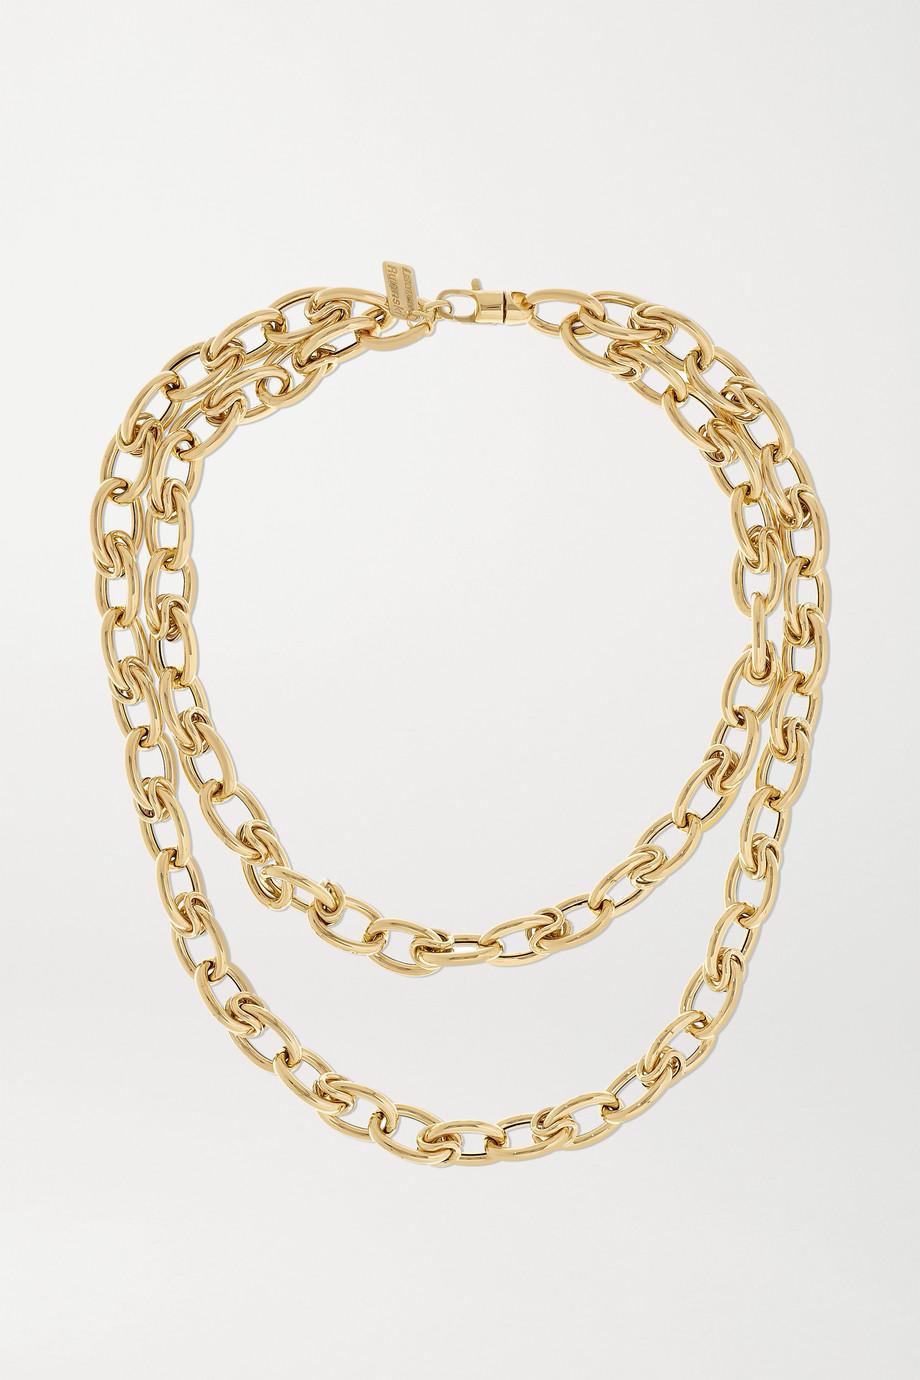 Lauren Rubinski Kette aus 14Karat Gold